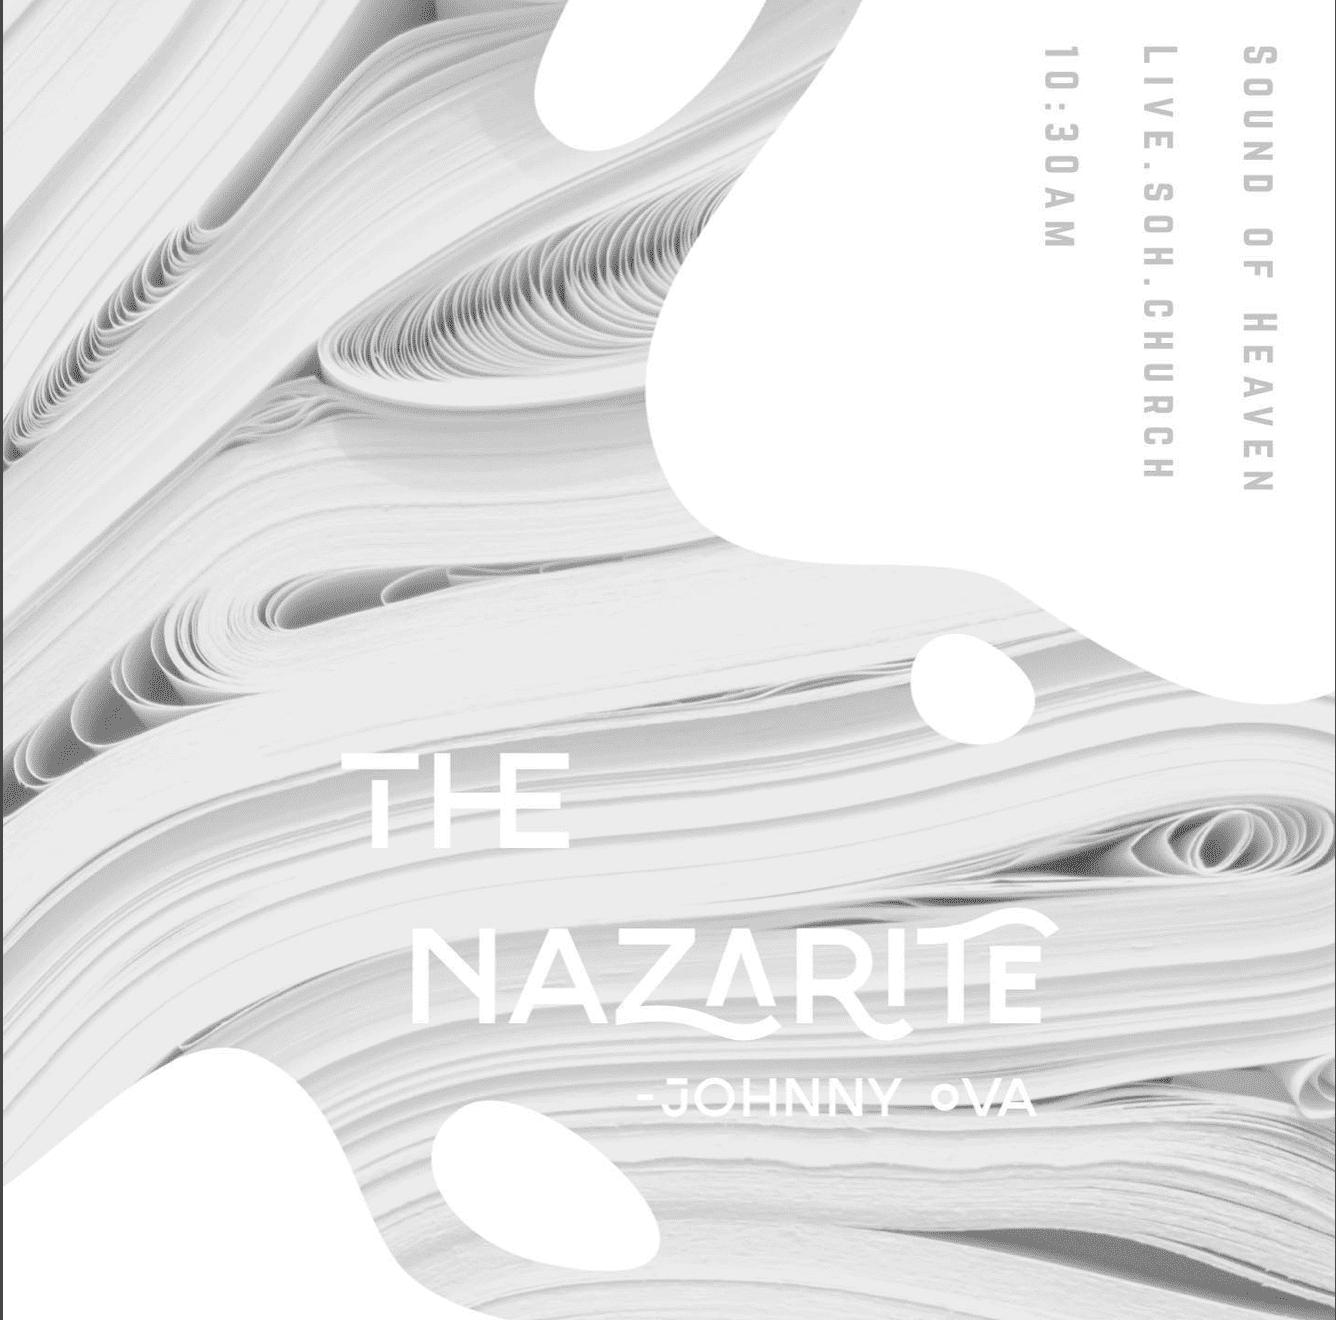 The Nazarite